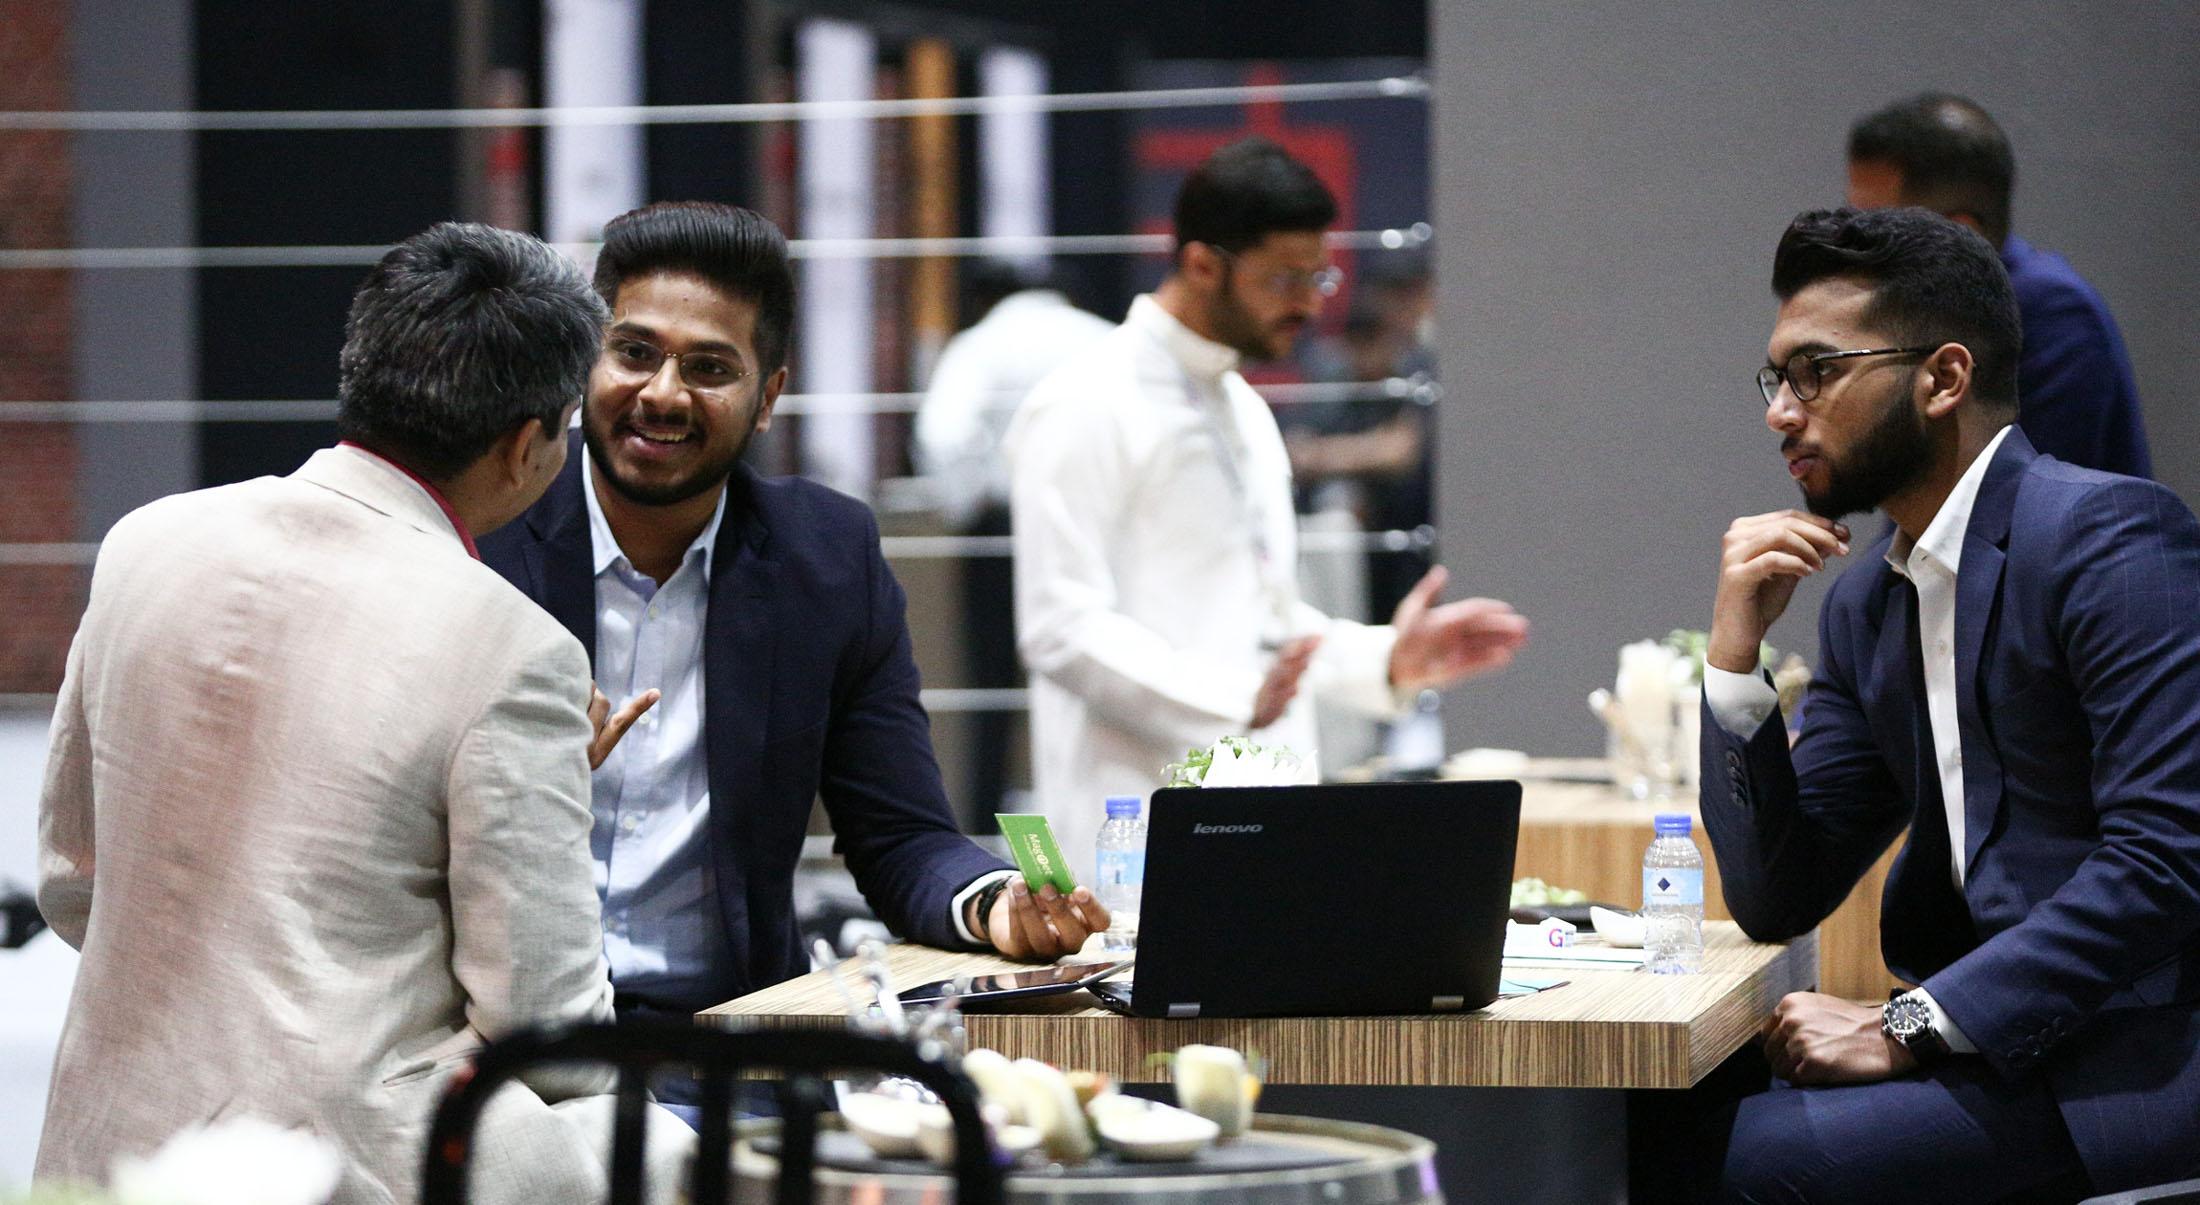 Lebanese Tech Startups Look to Dubai for Global Growth